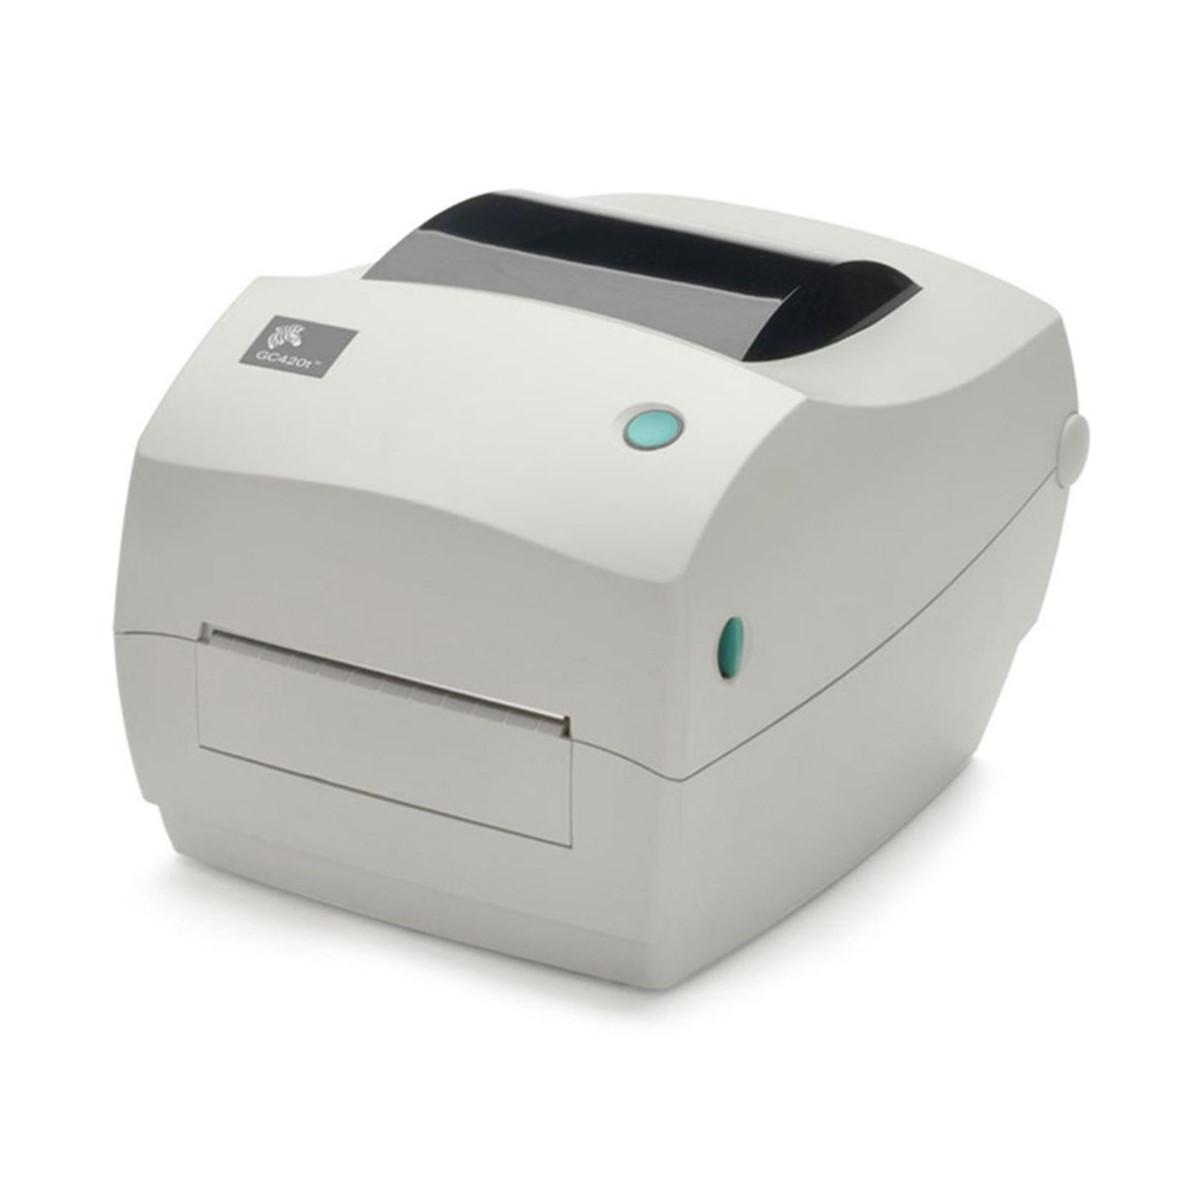 Impressora Térmica GC420T | GC420-1005A0-000 | Zebra